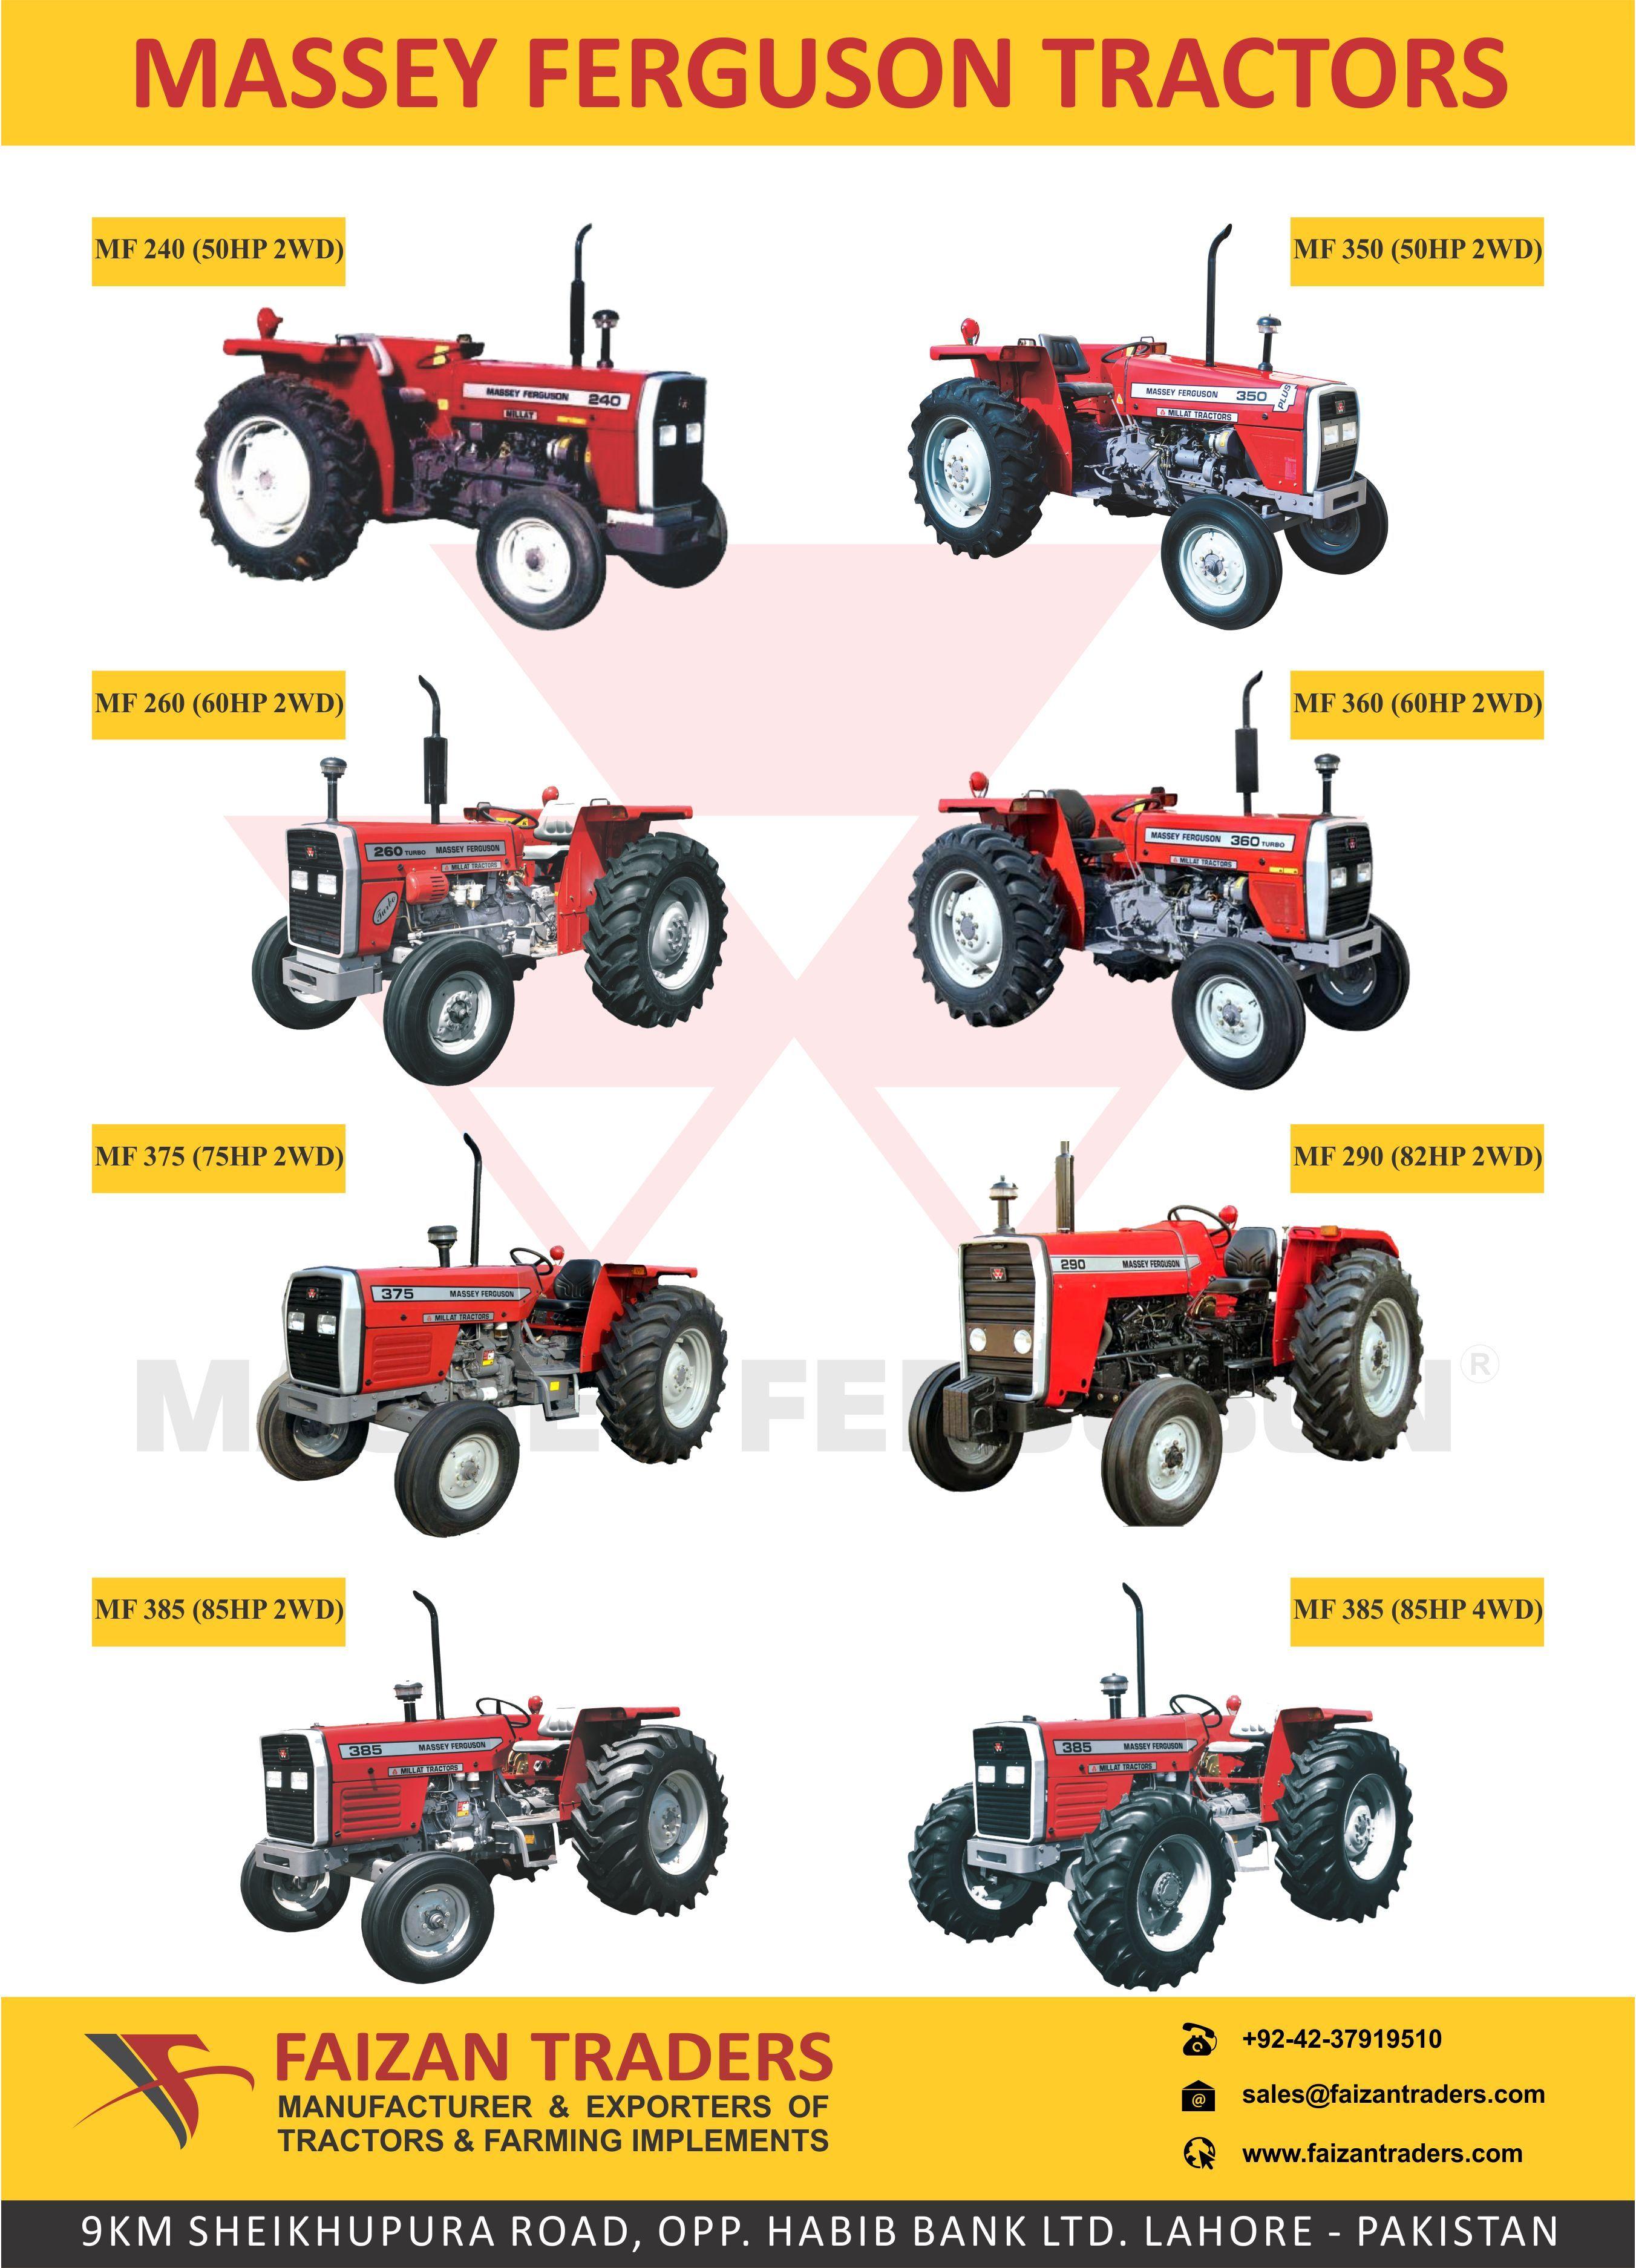 Berühmt Source Brand New Massey Ferguson Tractors from Pakistan | Tractors &HM_38